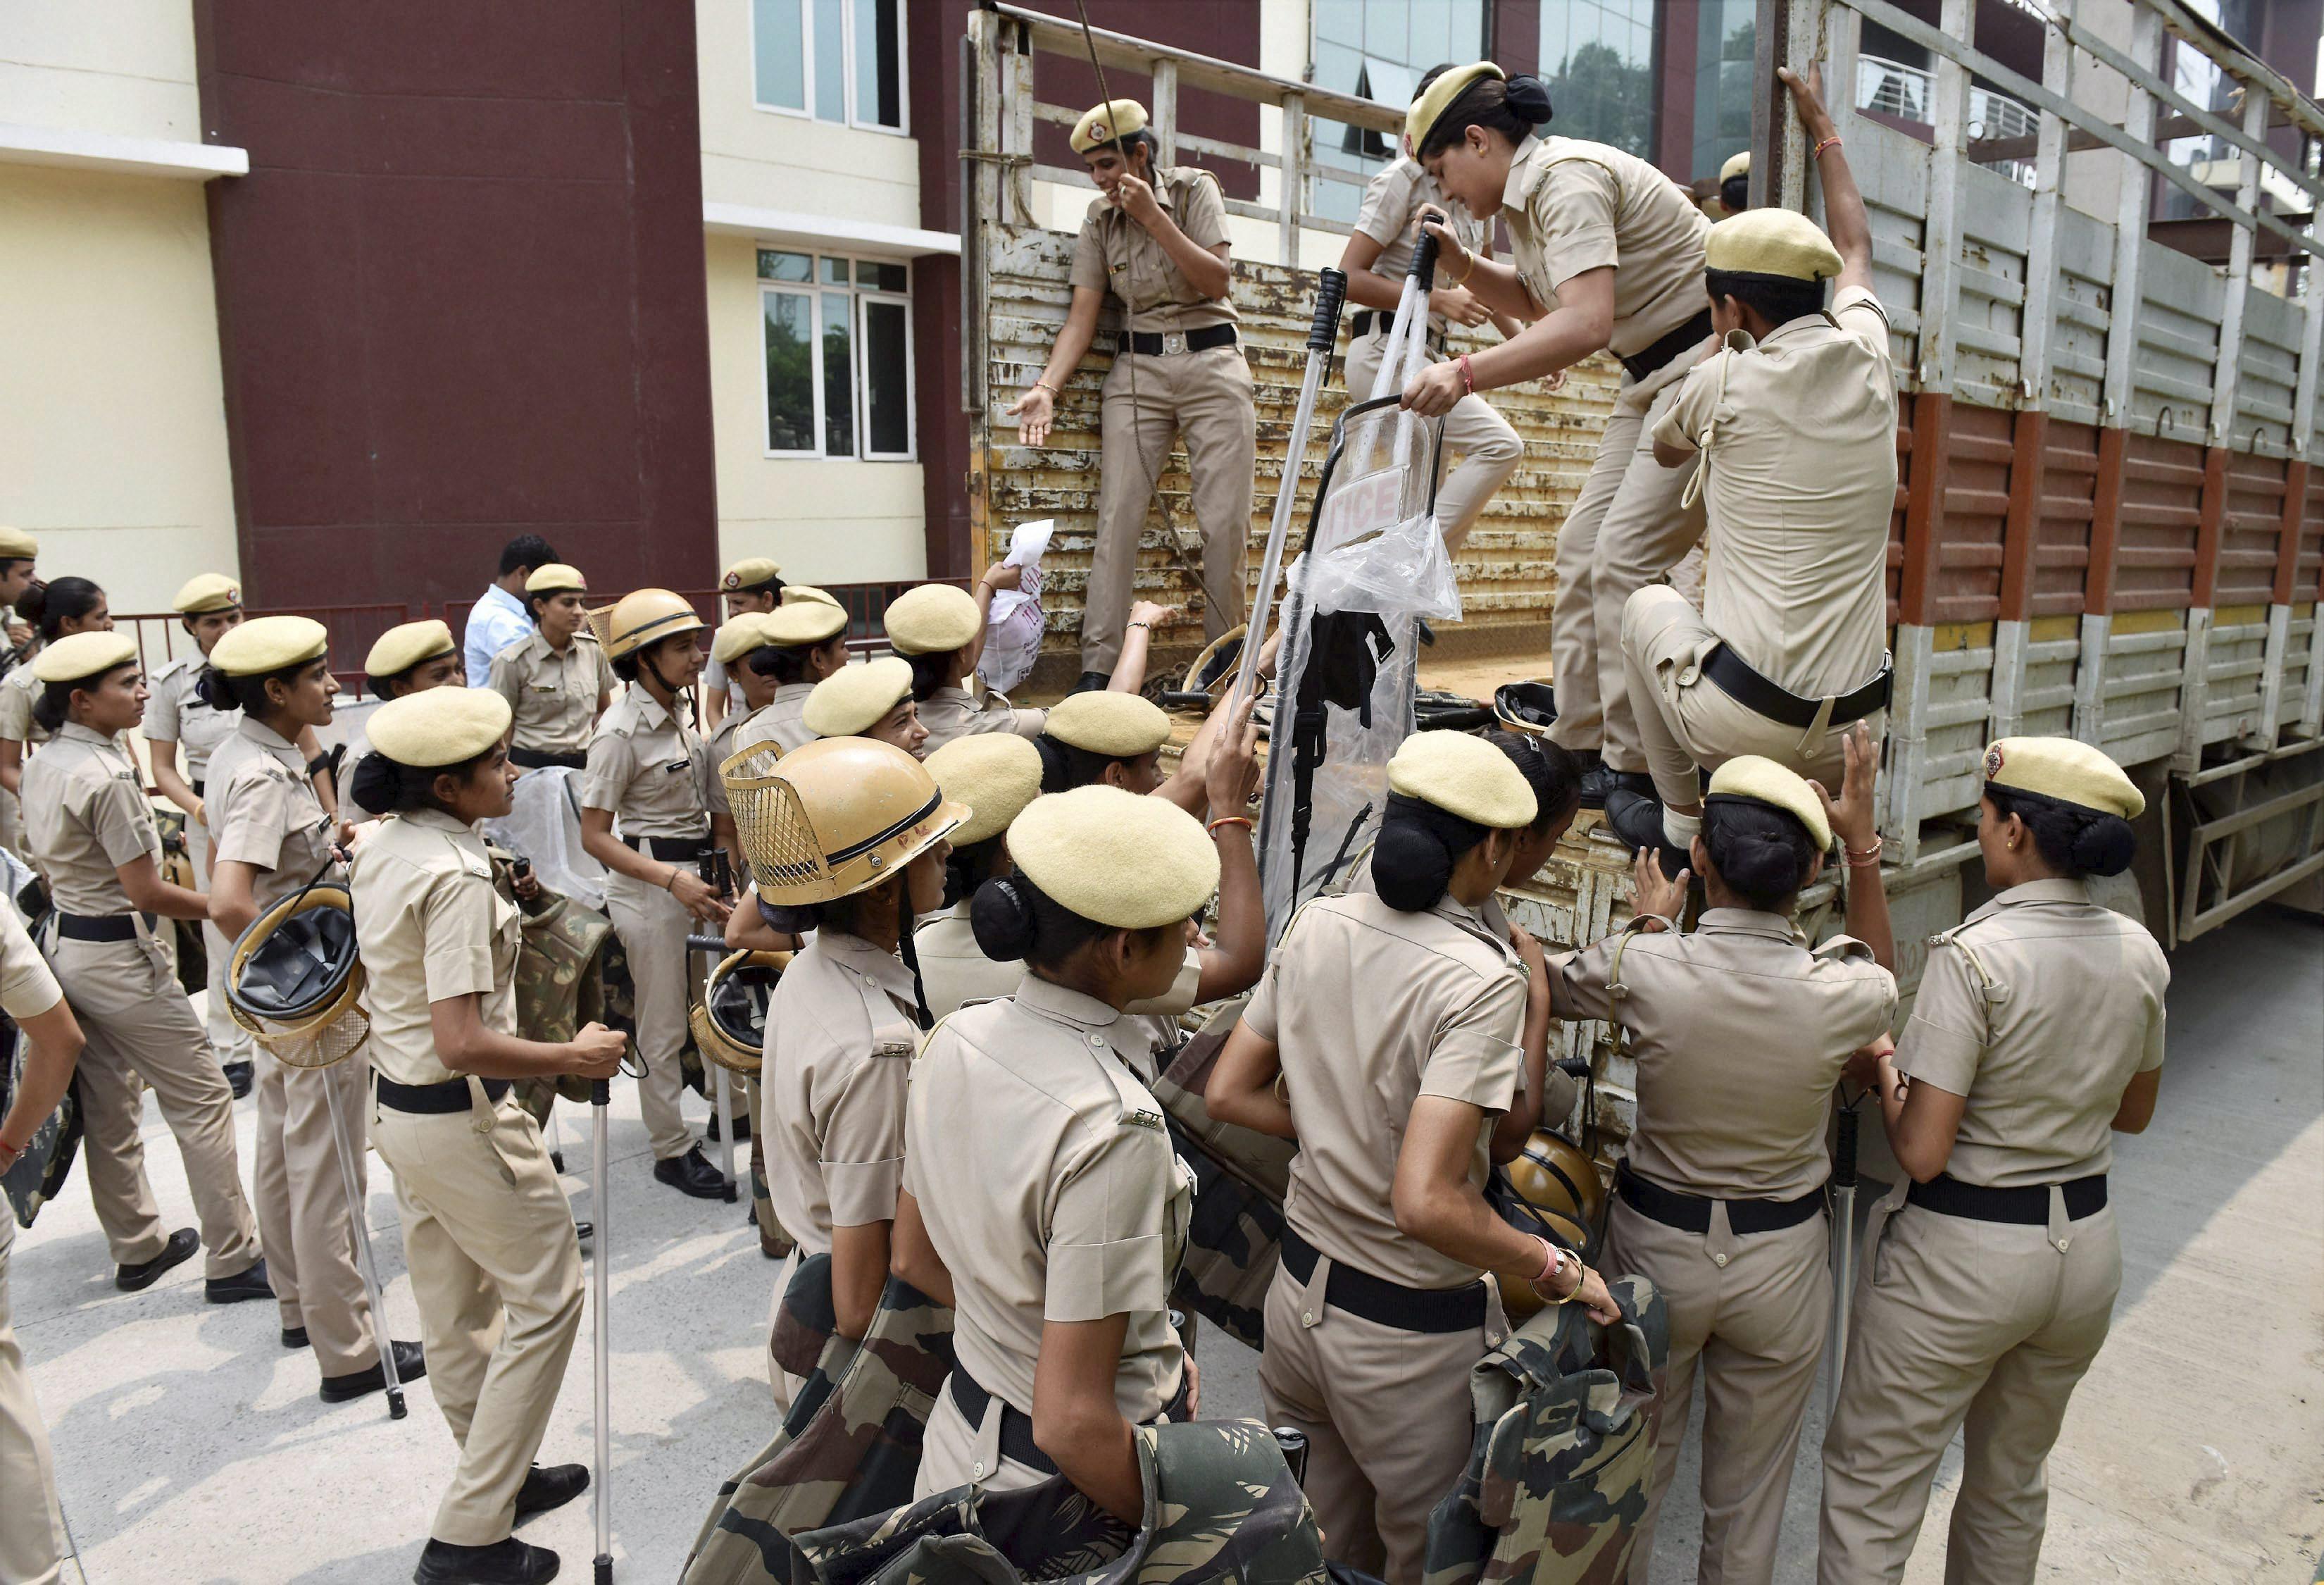 Gurugram: Women police personnel prepare in Gurugram in view of the verdict in the case against Dera Sacha Sauda chief Gurmeet Ram Rahim on Friday. PTI Photo (PTI8_25_2017_000053B)